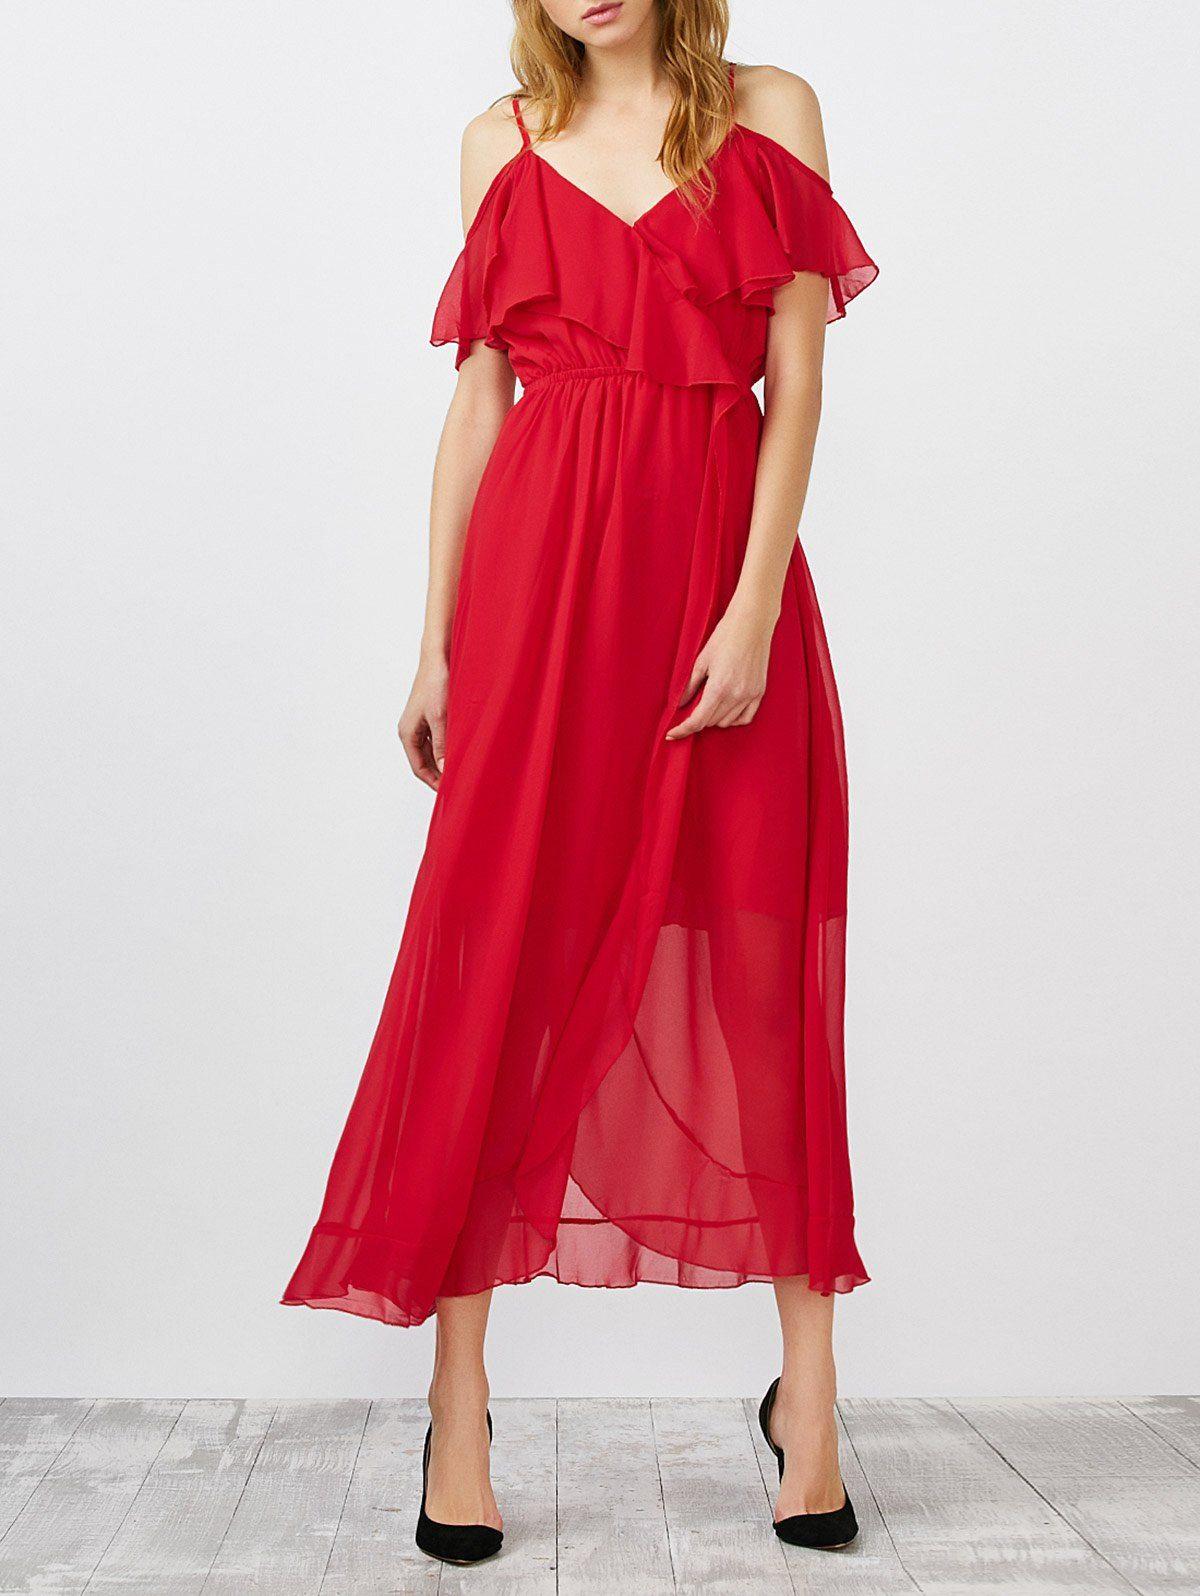 Empire waist ruffle slit spaghetti strap dress in red sammydress